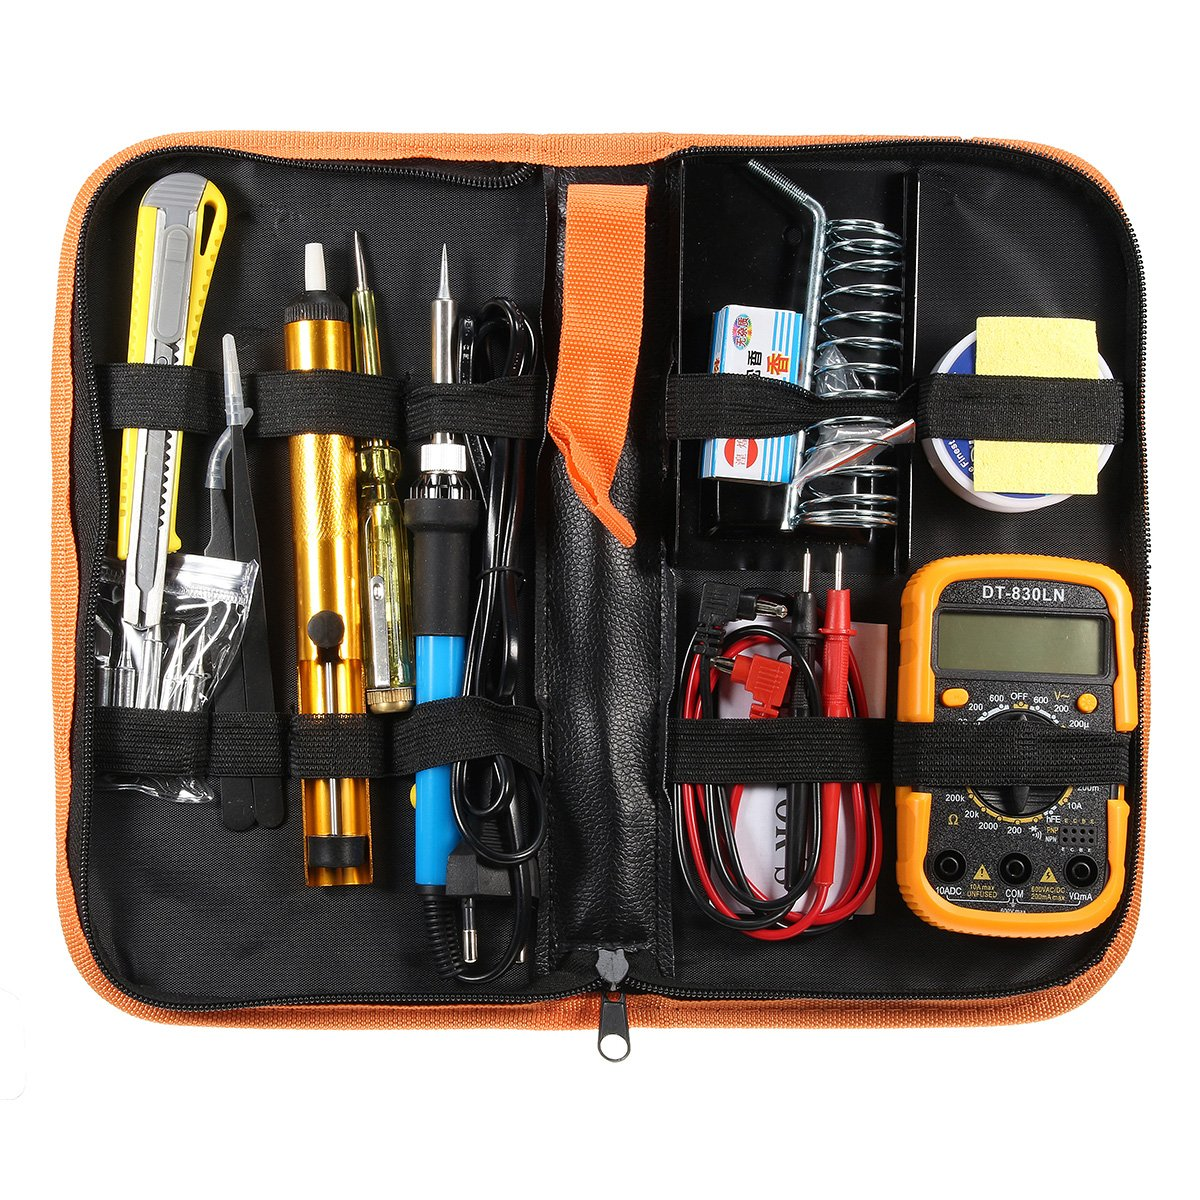 UL 110V/220V 60W Adjustable Temperature Welding Solder Soldering Iron Multimeter Tool Kits (EU)